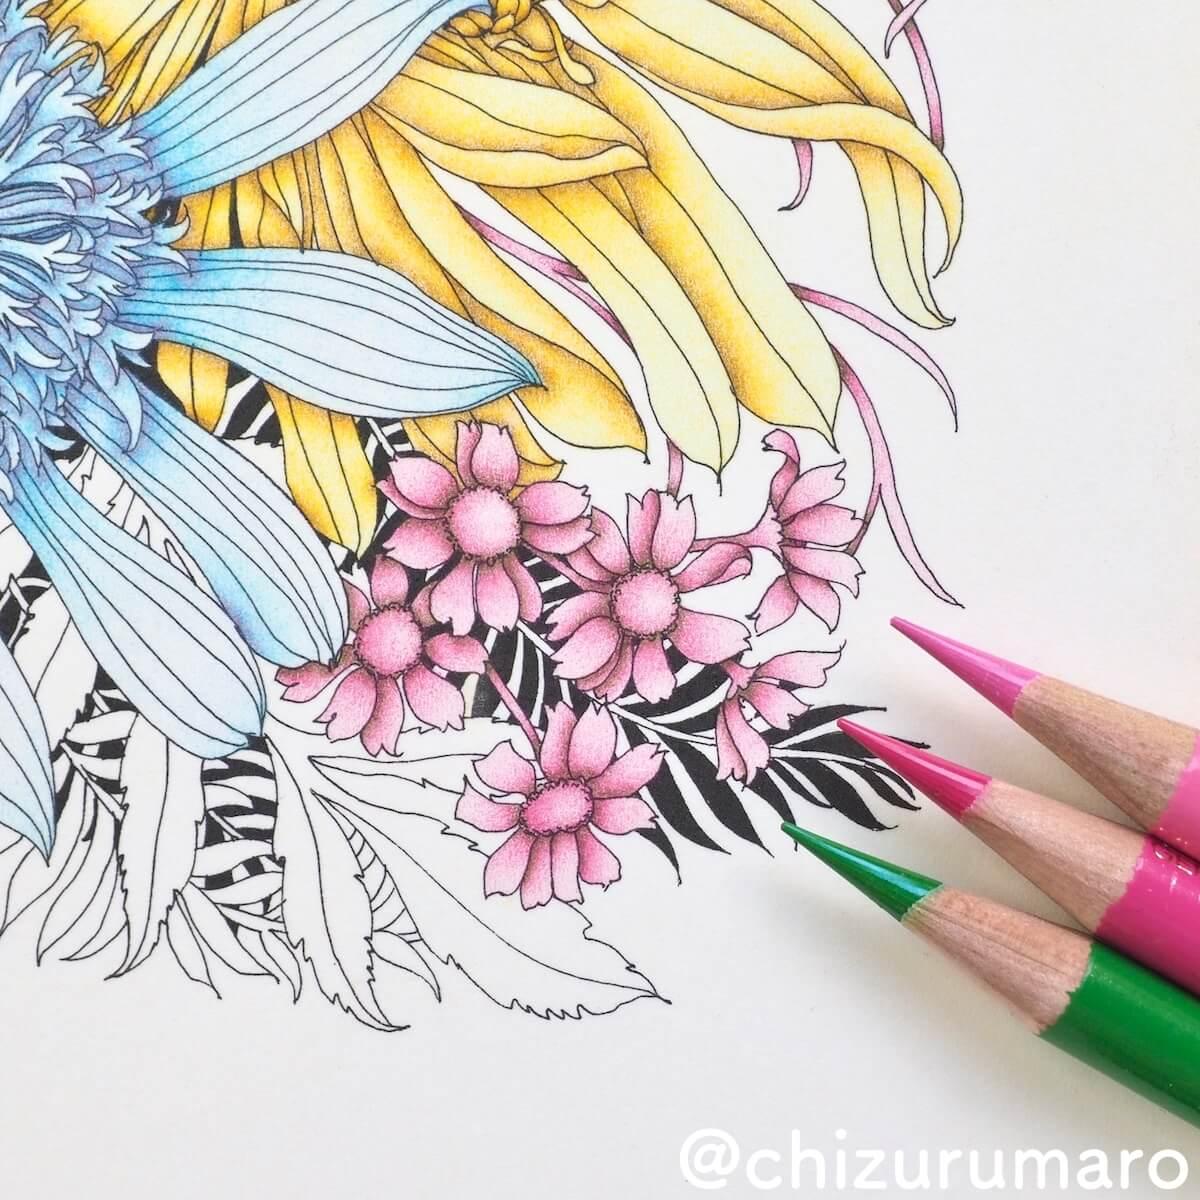 f:id:chizurumaro:20190427143123j:plain